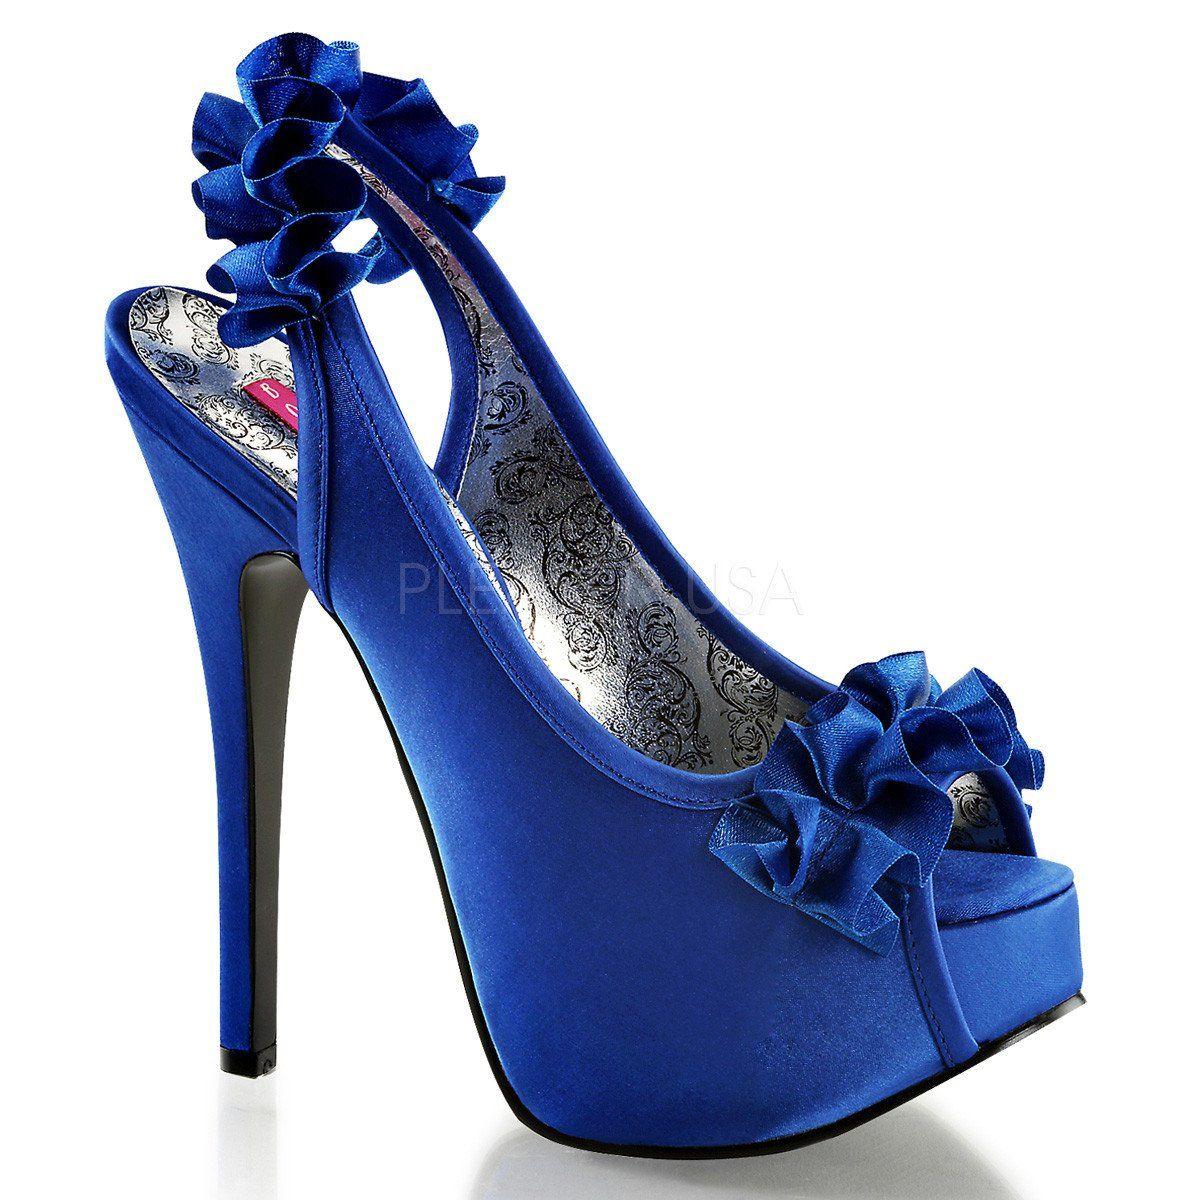 Bordello teeze navy blue satin shoes shoe pinterest